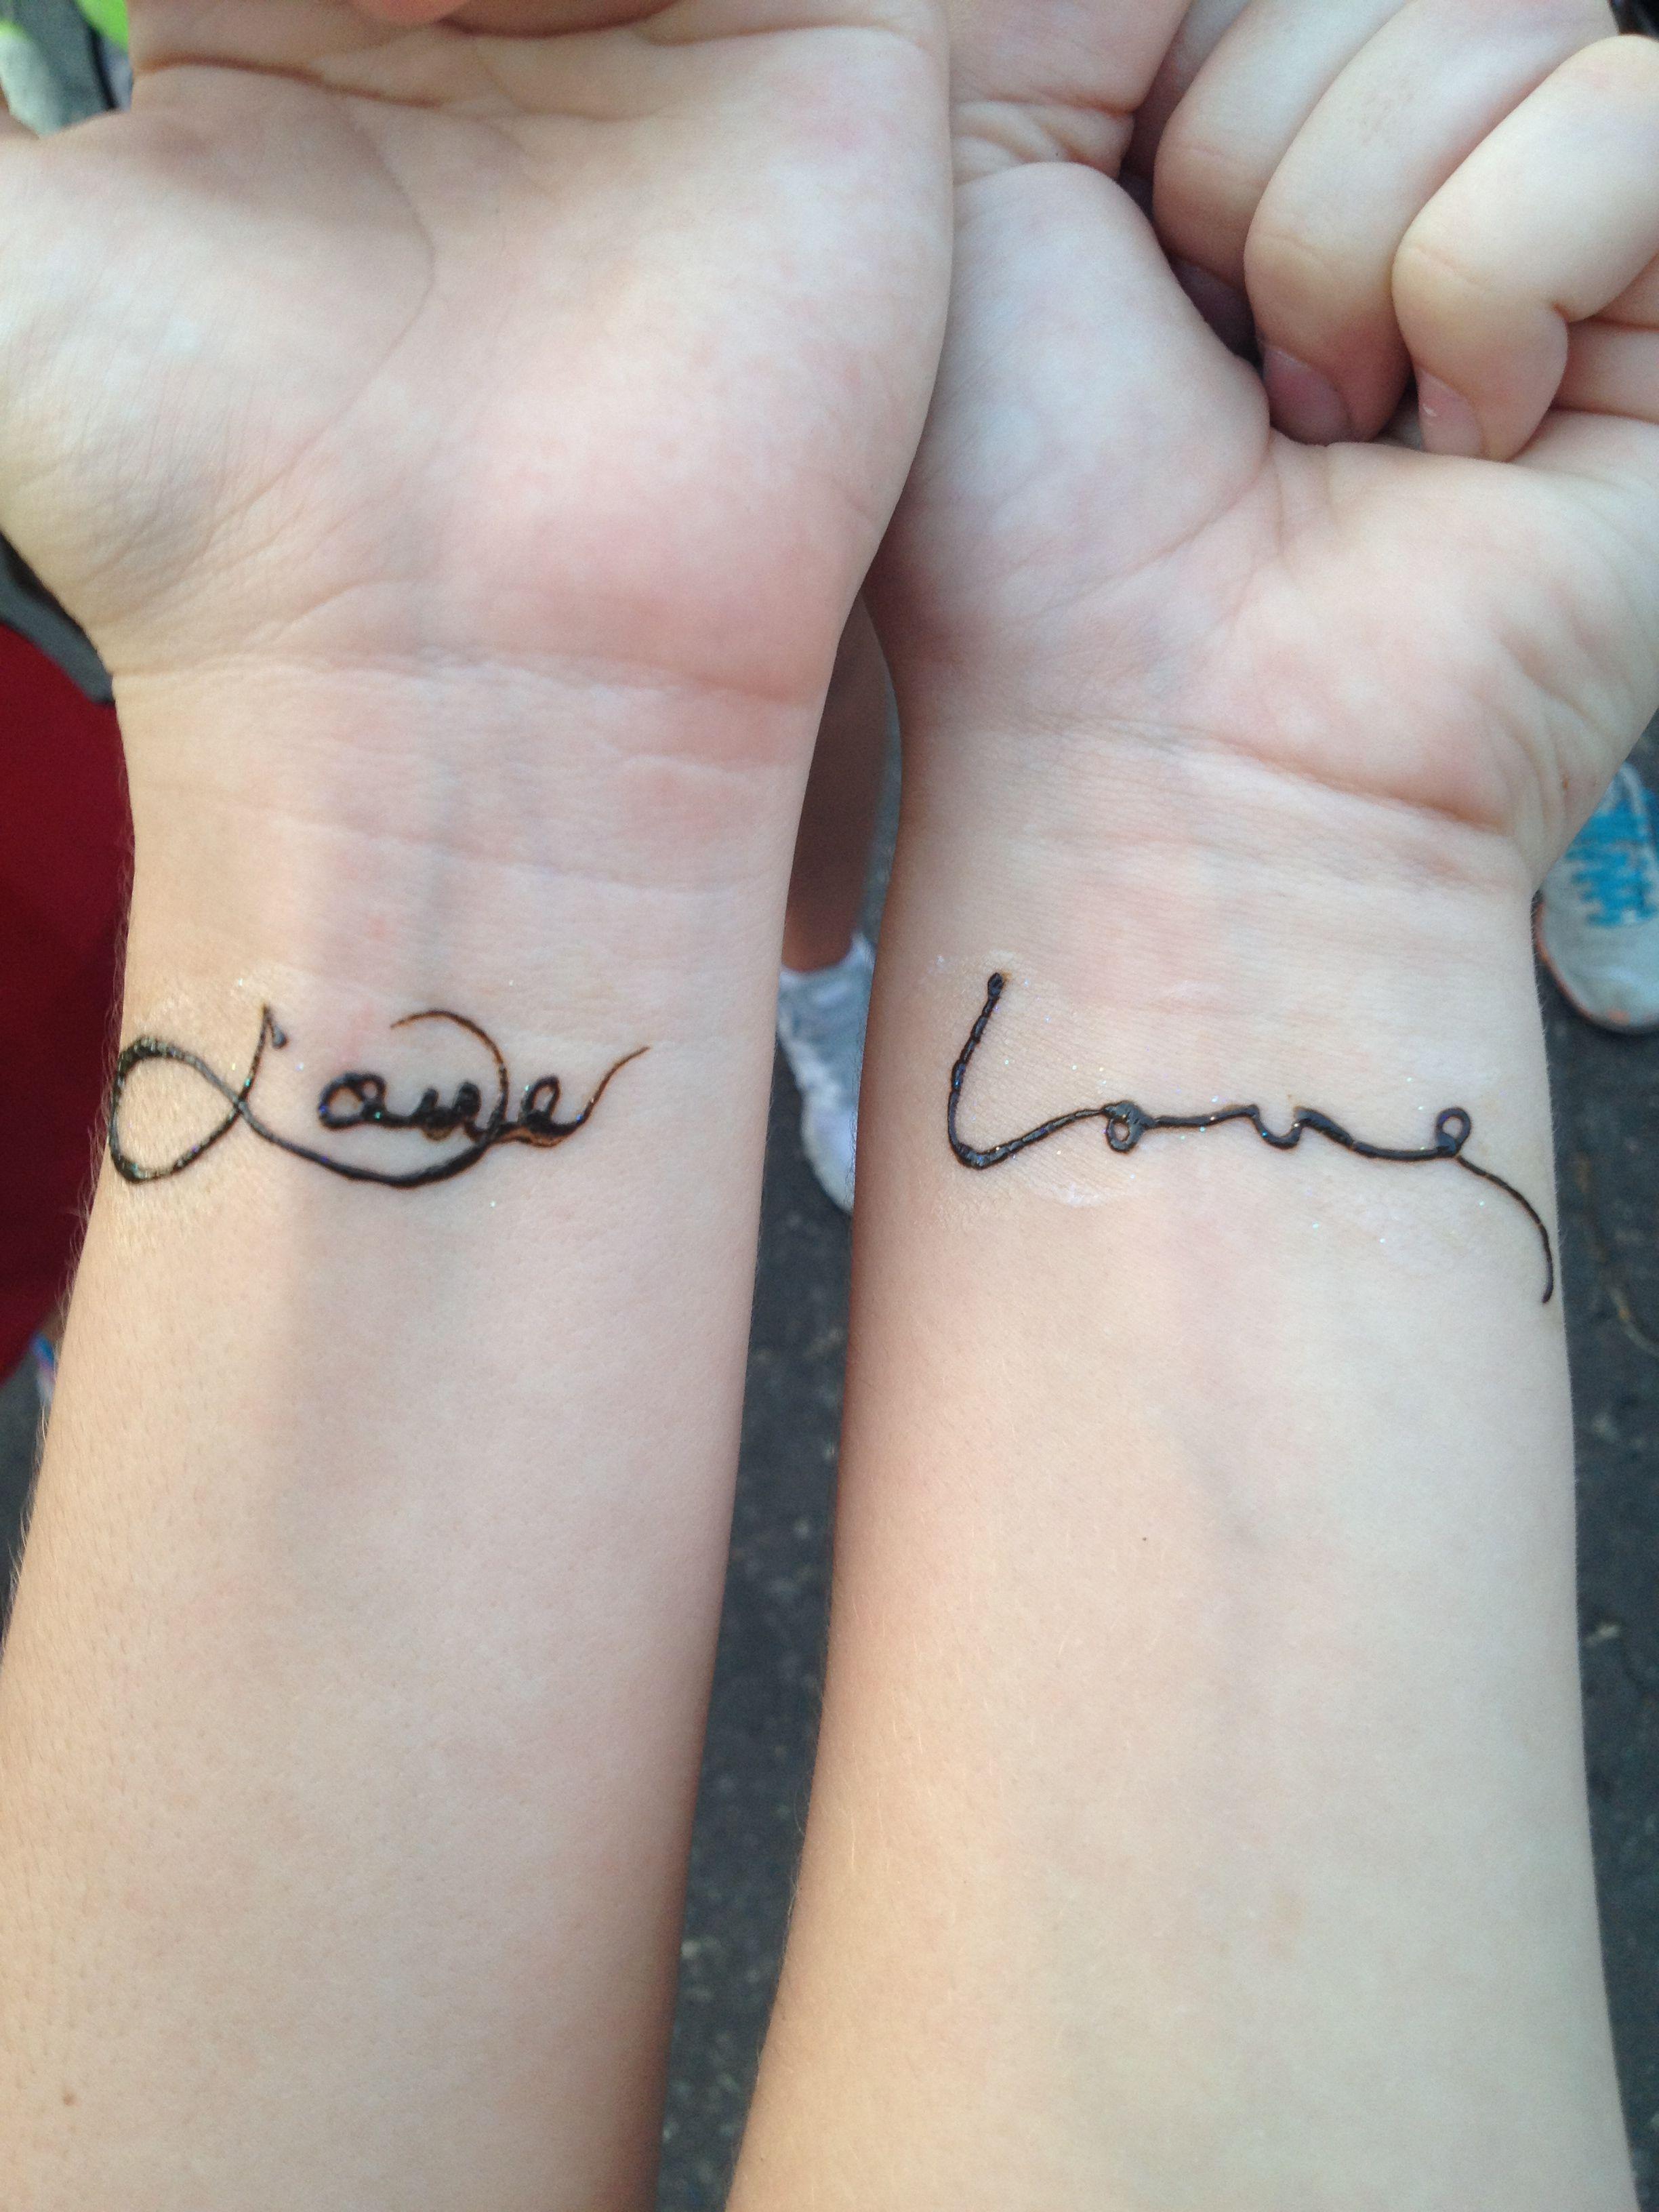 Best Friend Henna Tattoos : friend, henna, tattoos, Matching, Friend, Henna, Tattoos, Shaee!, Tattoo,, Tattoos,